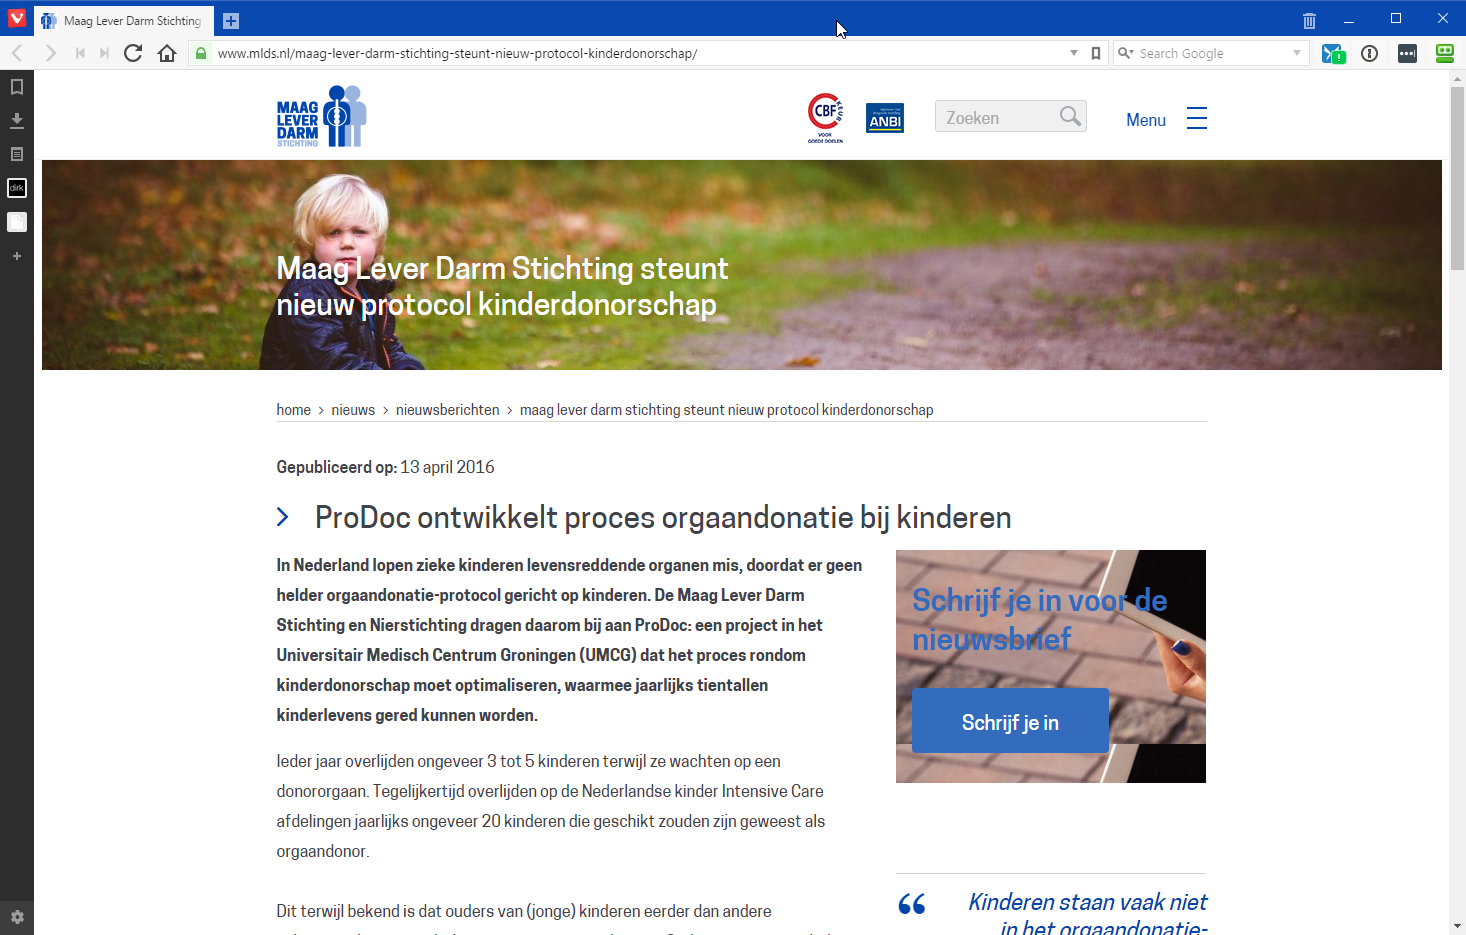 2016-04-13 12_18_09-Maag Lever Darm Stichting steunt nieuw protocol kinderdonorschap - Maag Lever Da